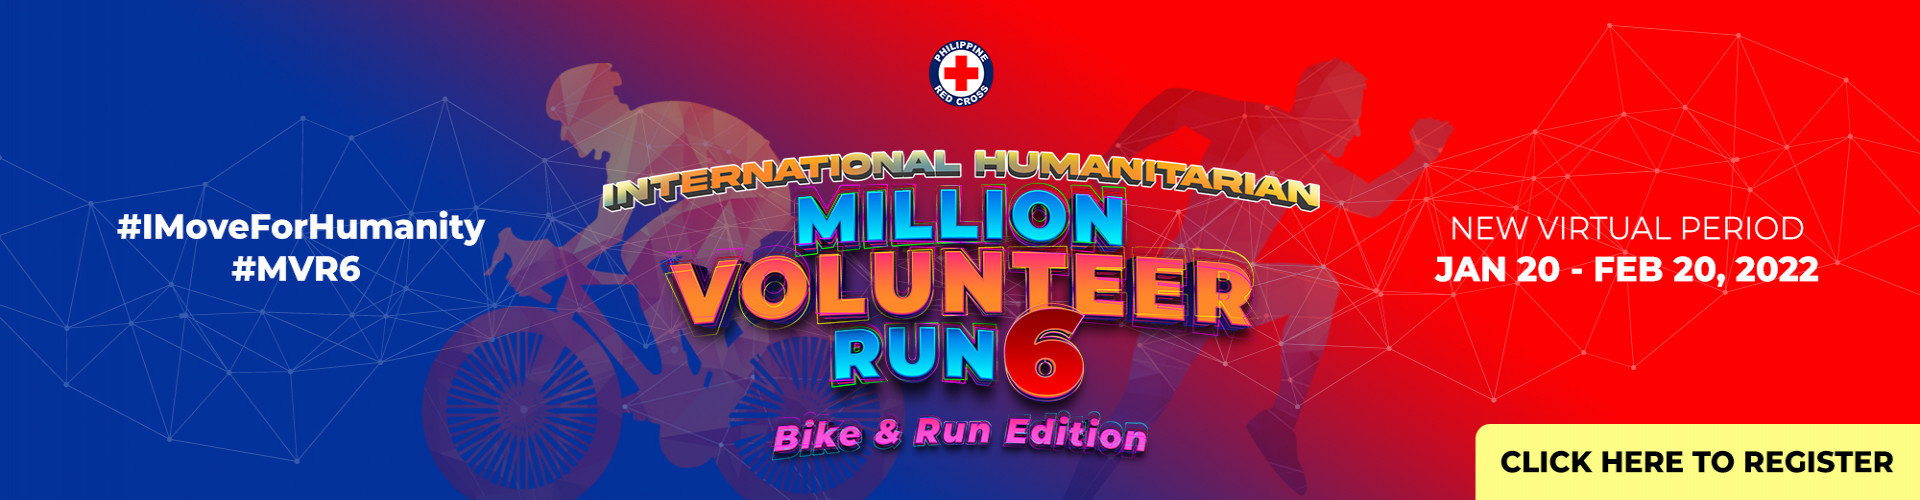 Philippine Red Cross MVR-6